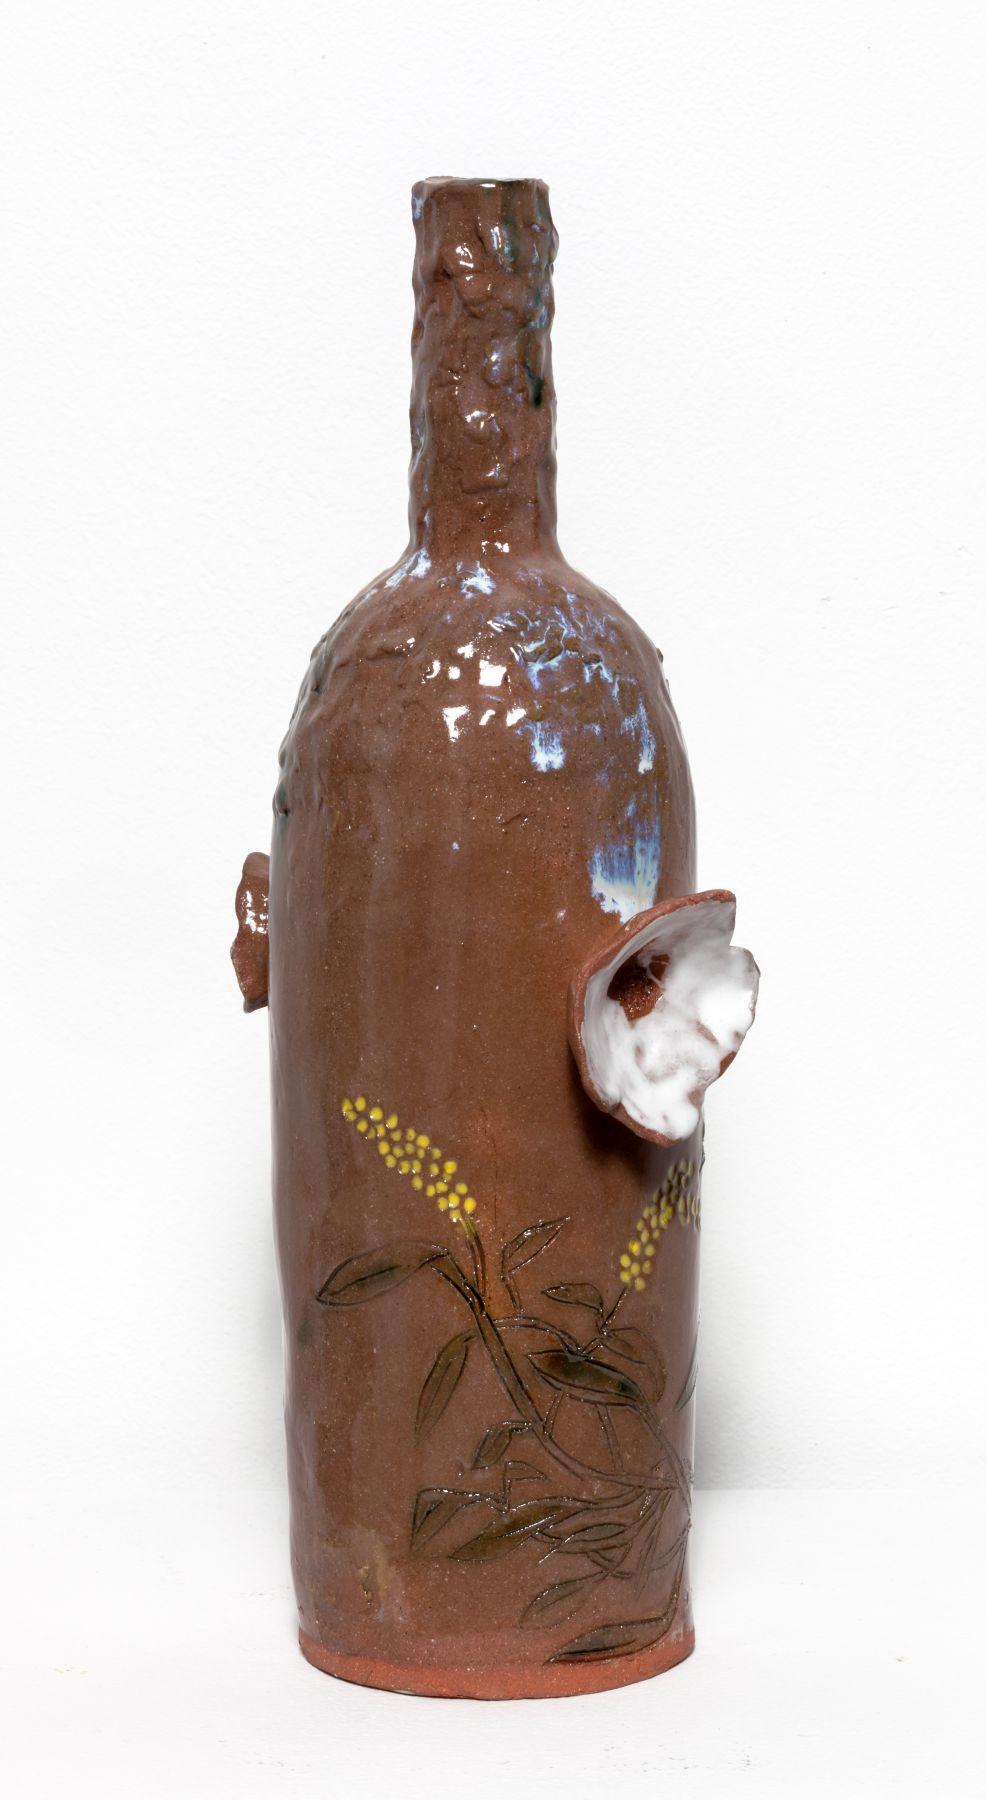 LISA SANDITZ, New Growth Wine Bottle 3, 2019